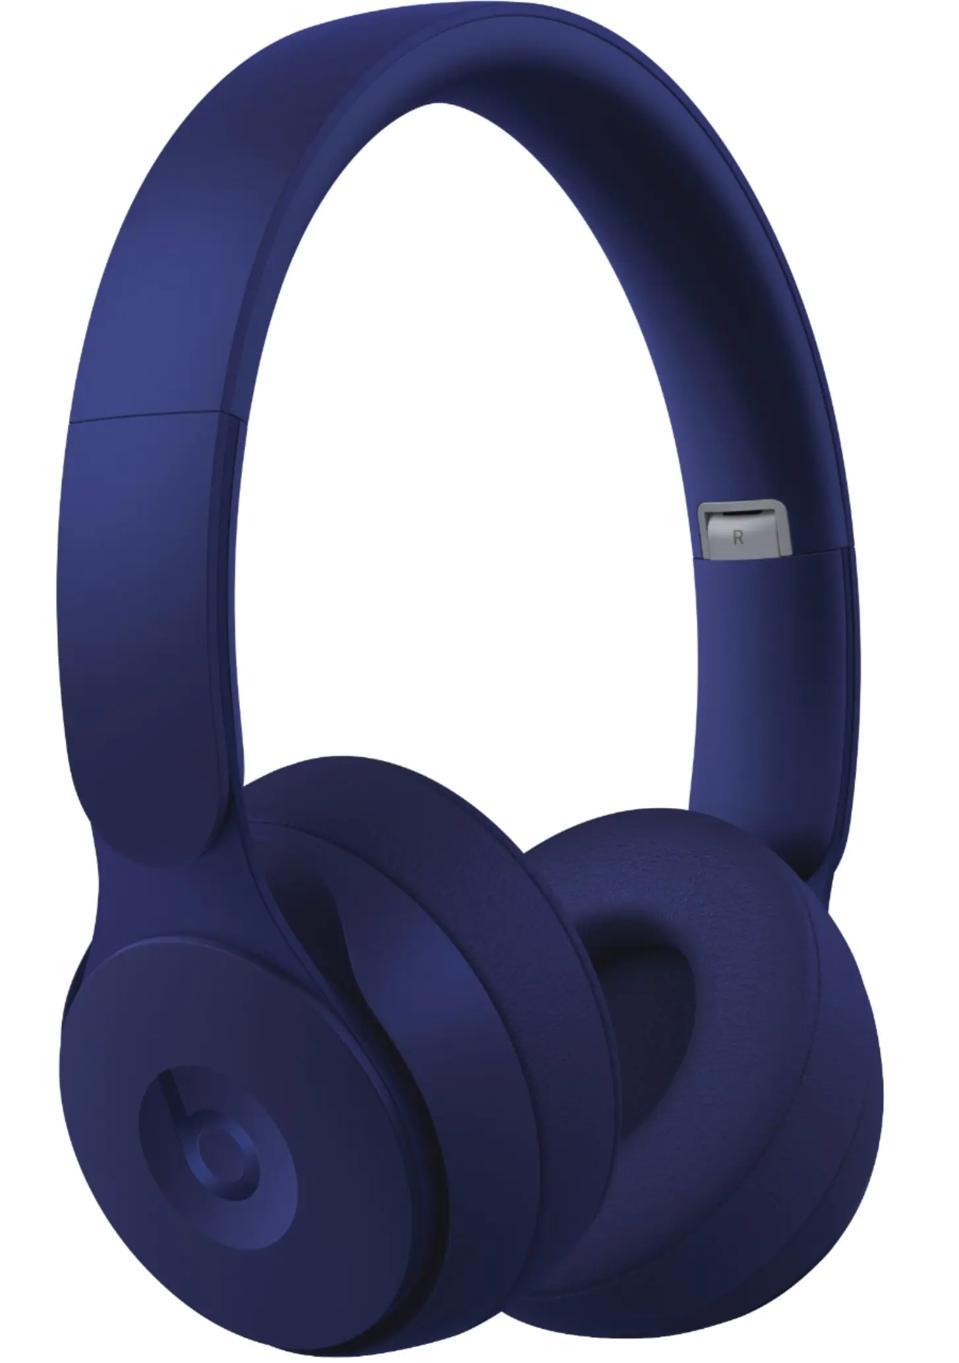 Best sales online: Beats by Dr. Dre - Solo Pro Wireless Noise Cancelling On-Ear Headphones